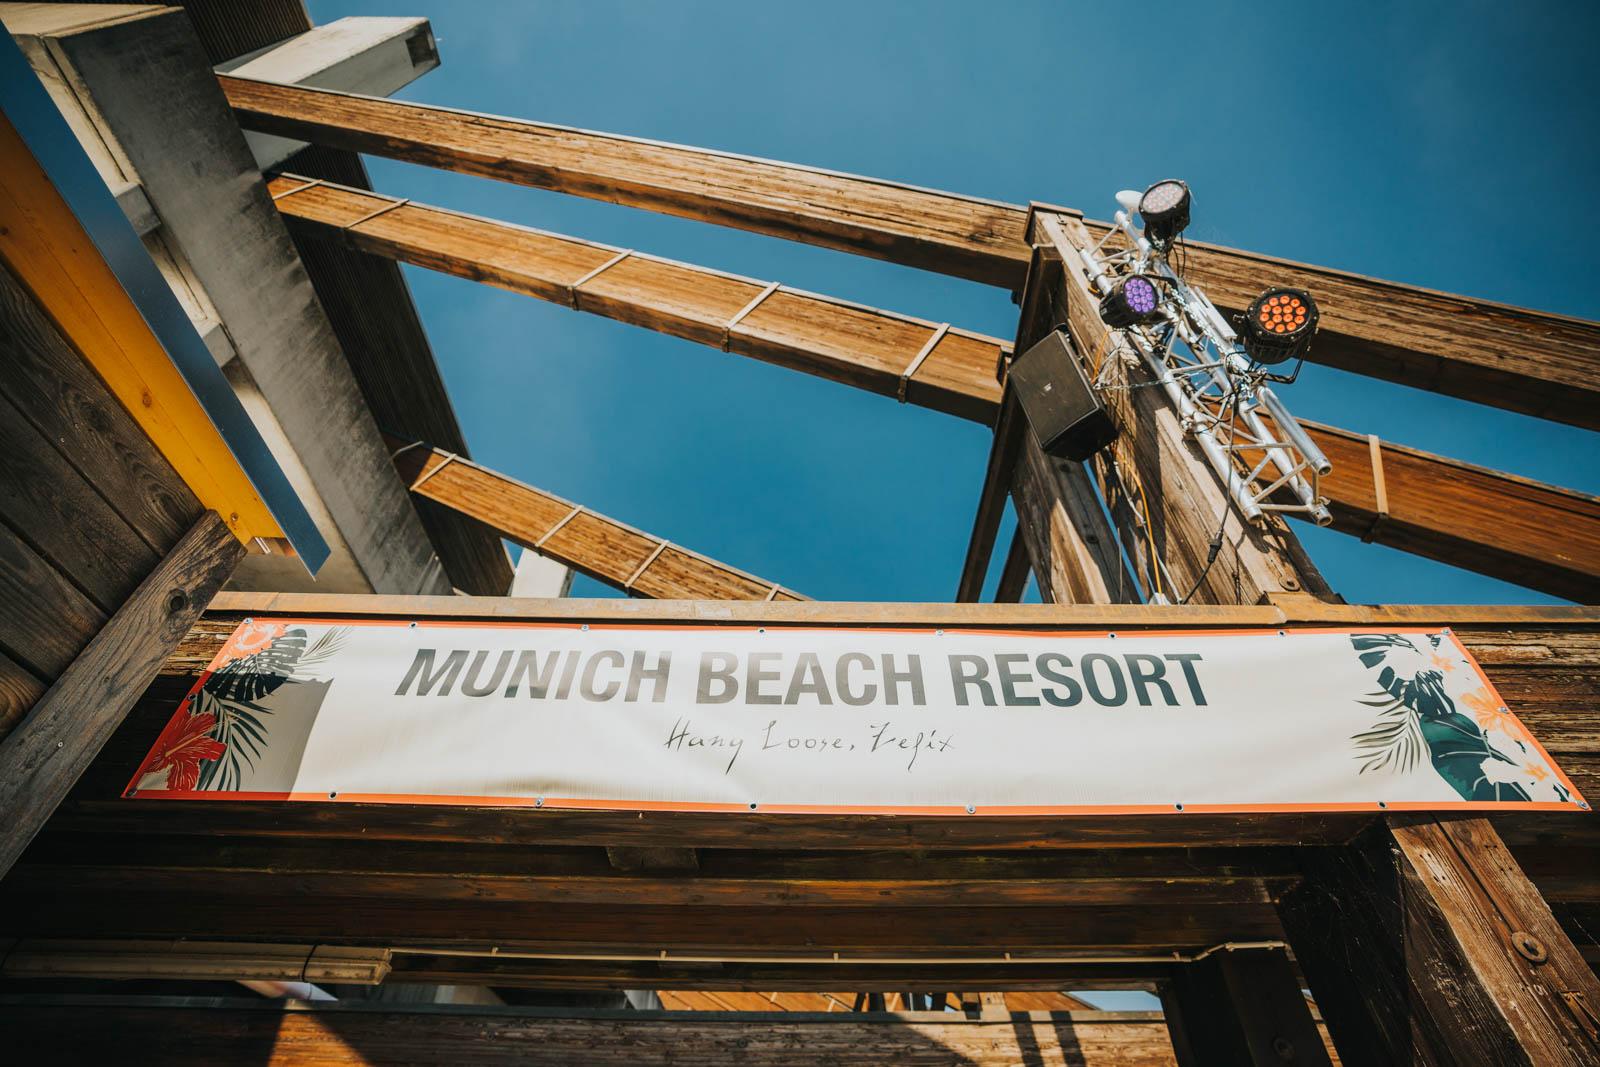 gavesi-eventcatering-im-munich-beach-resort-25072018-20